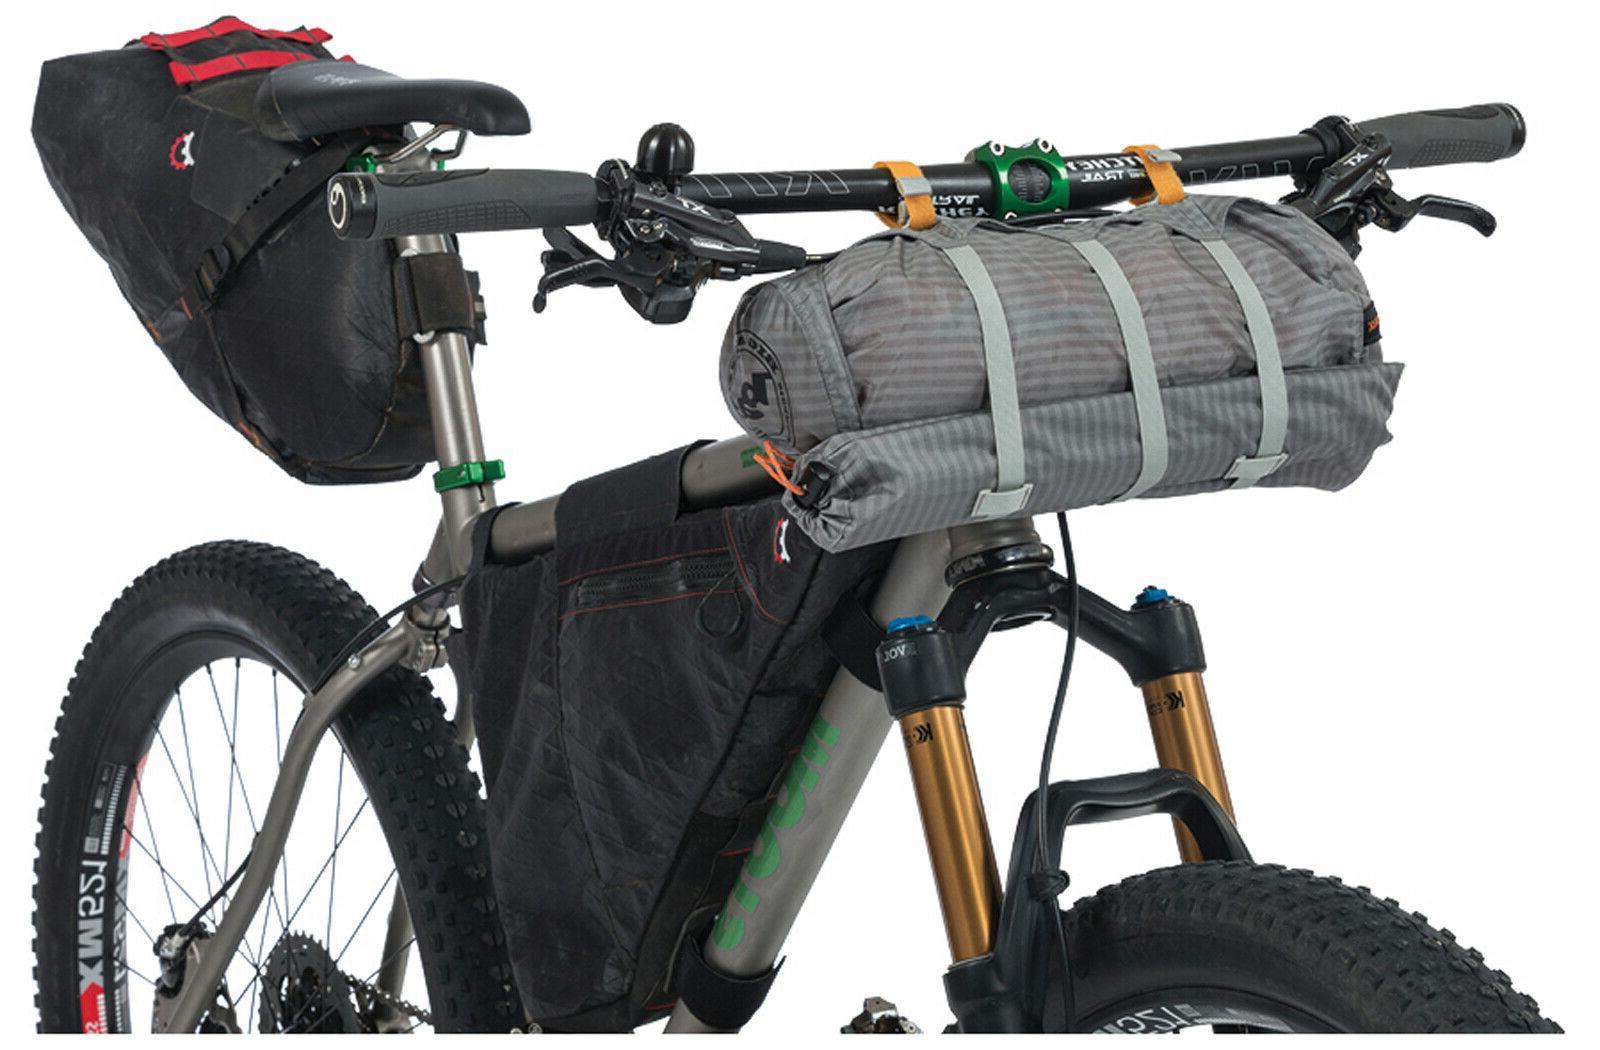 NEW FLY CREEK HV Bikepack light person tent